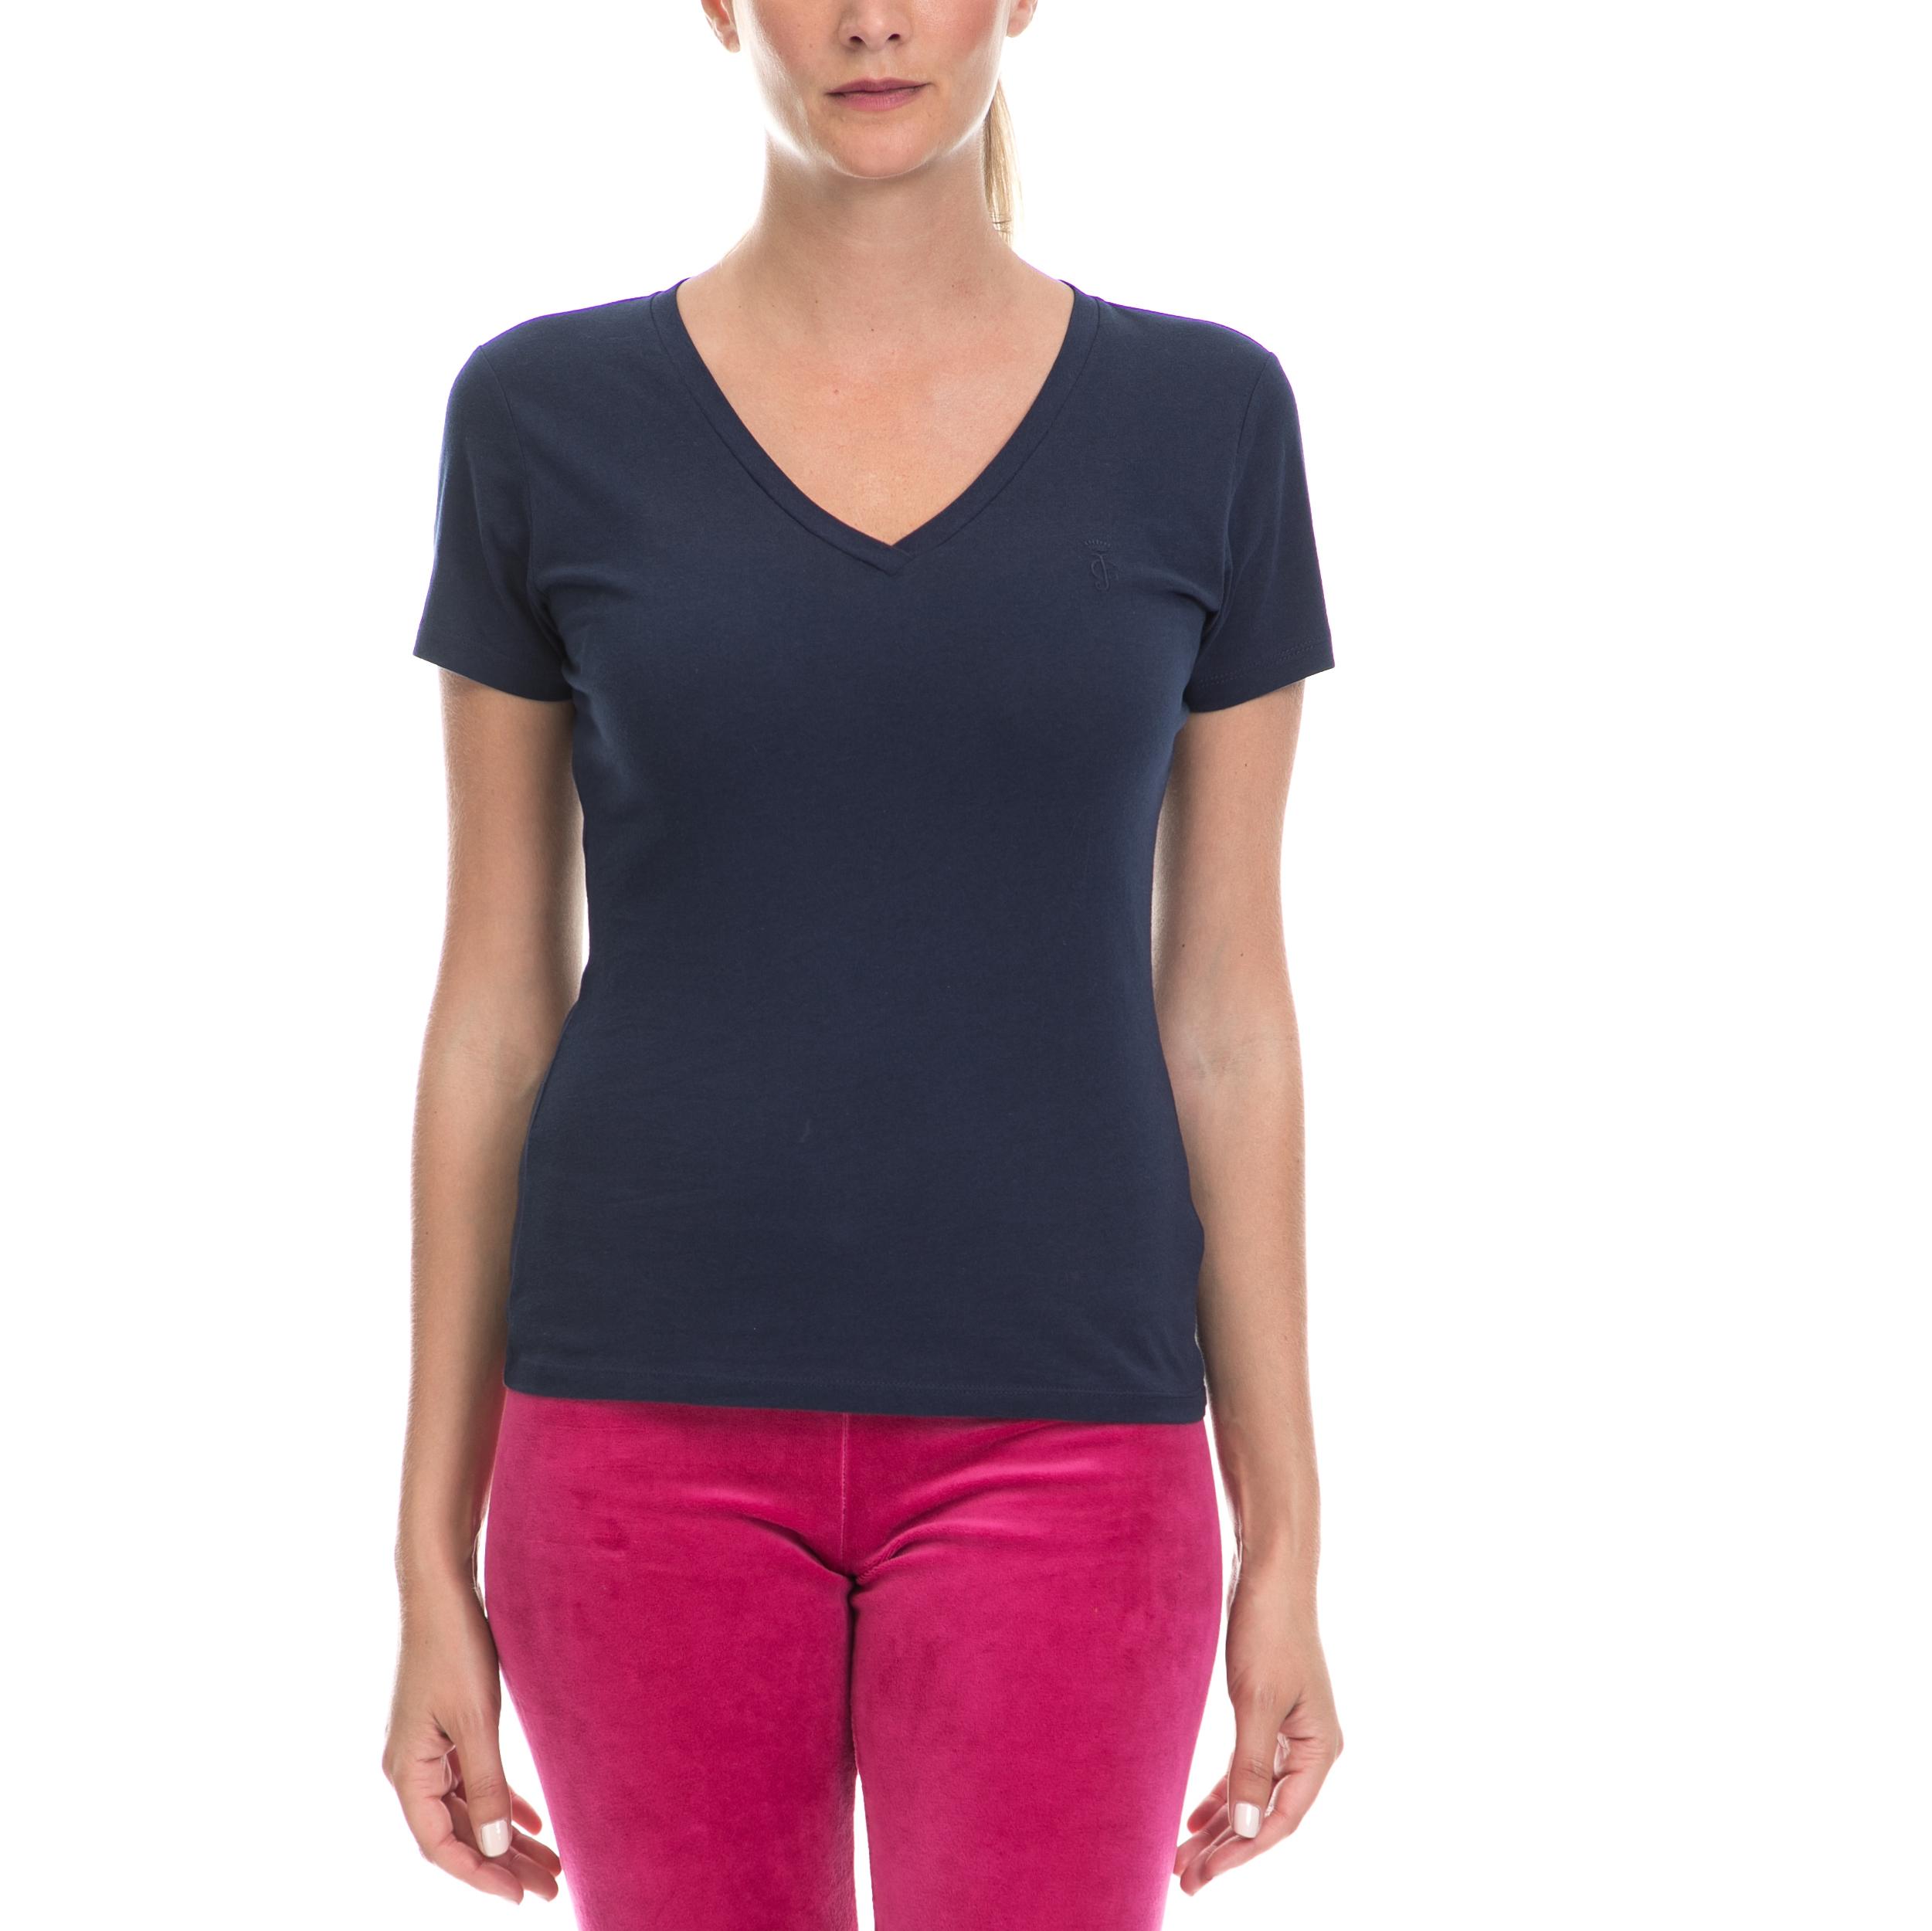 JUICY COUTURE – Γυναικεία μπλούζα JUICY COUTURE μπλε